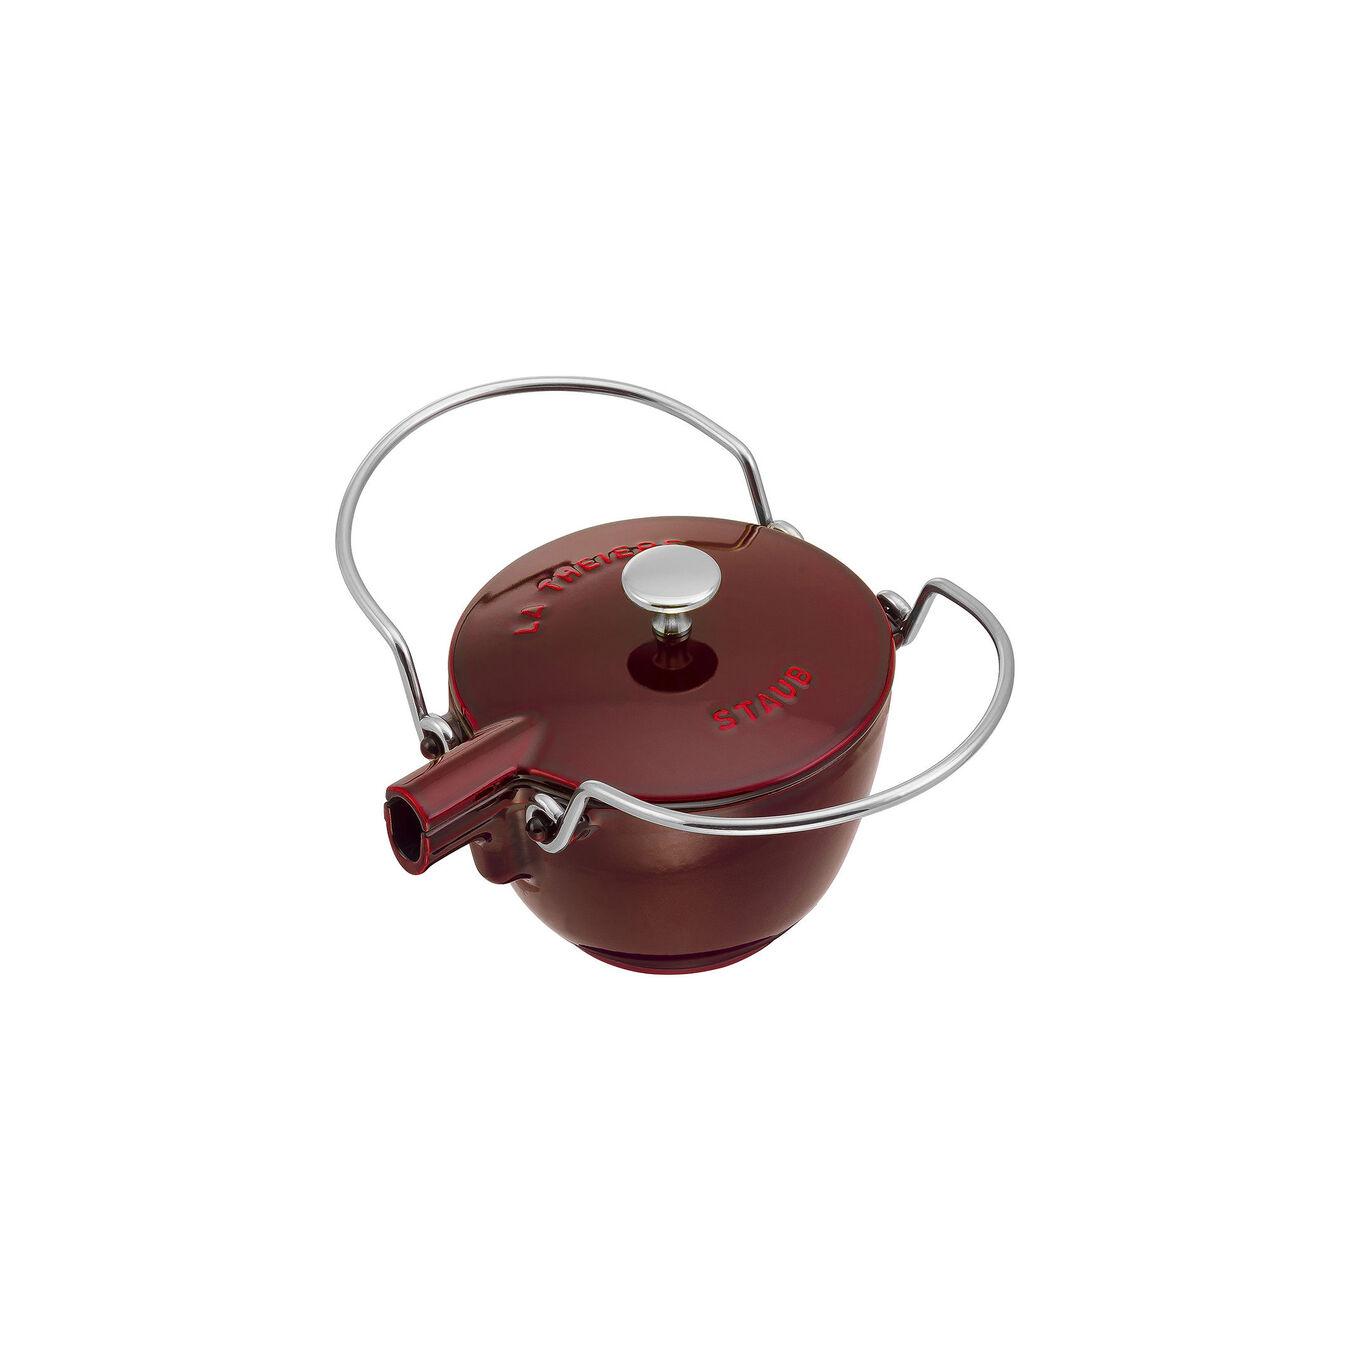 1-qt Round Tea Kettle - Grenadine,,large 2